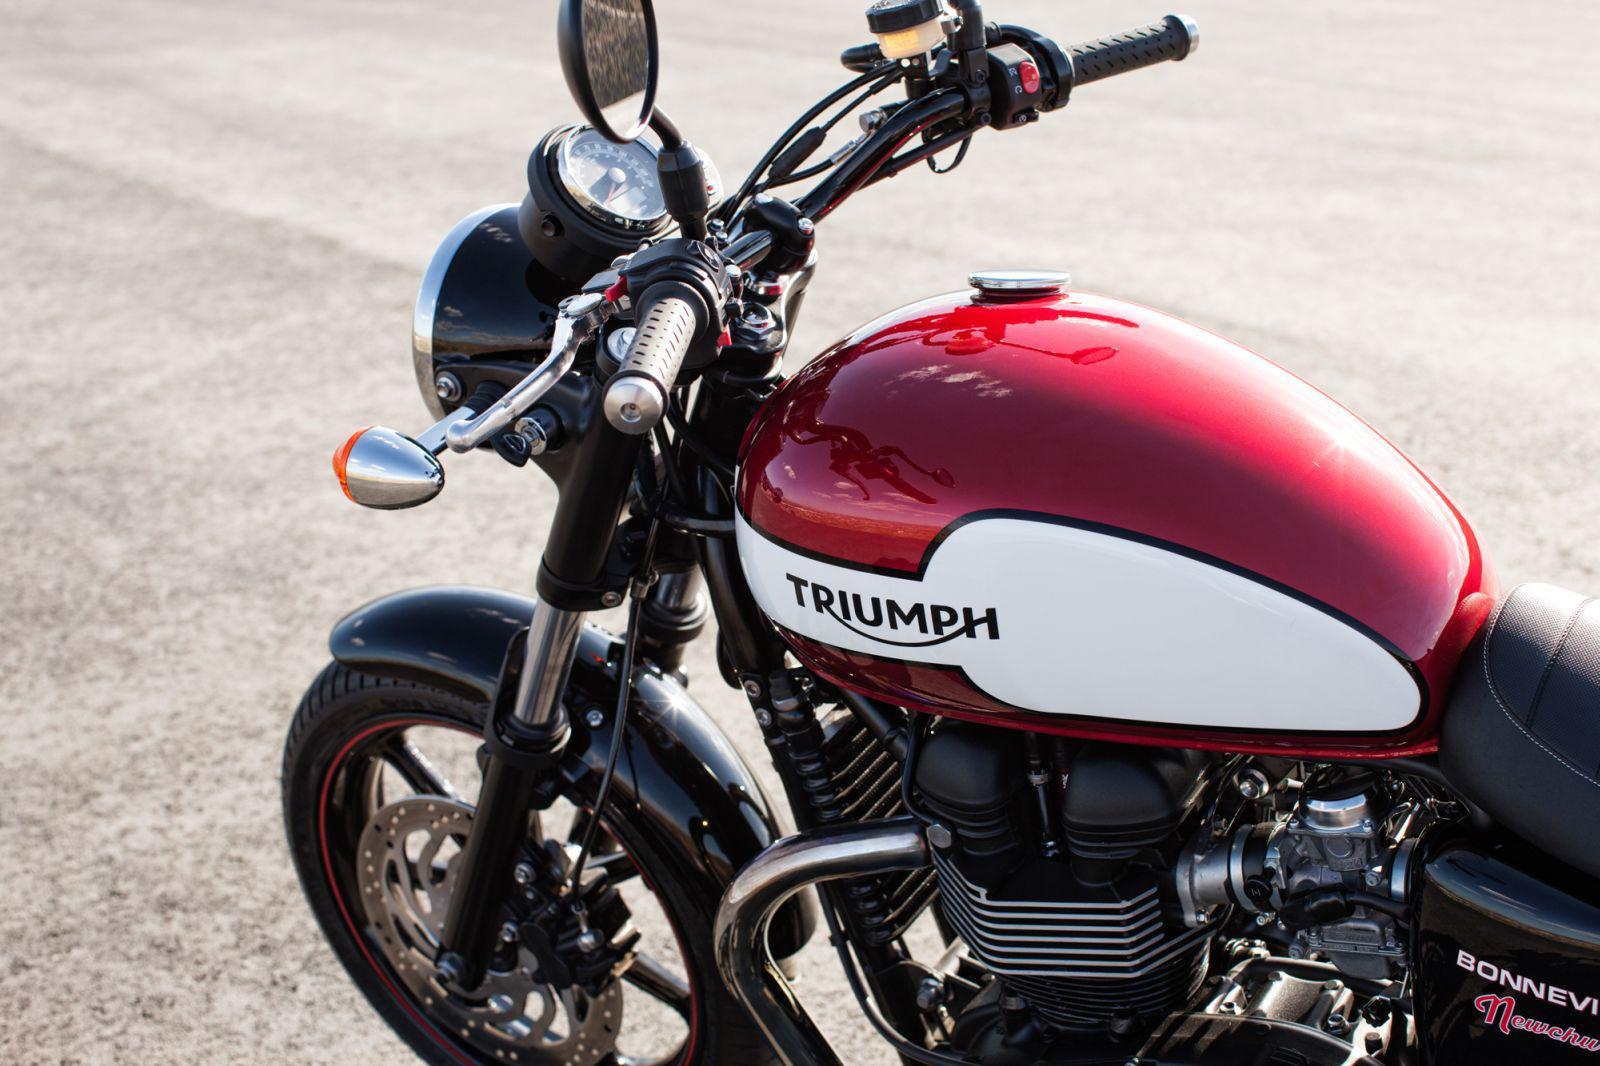 Triumph Bonneville Lenker Motorrad Bild Idee